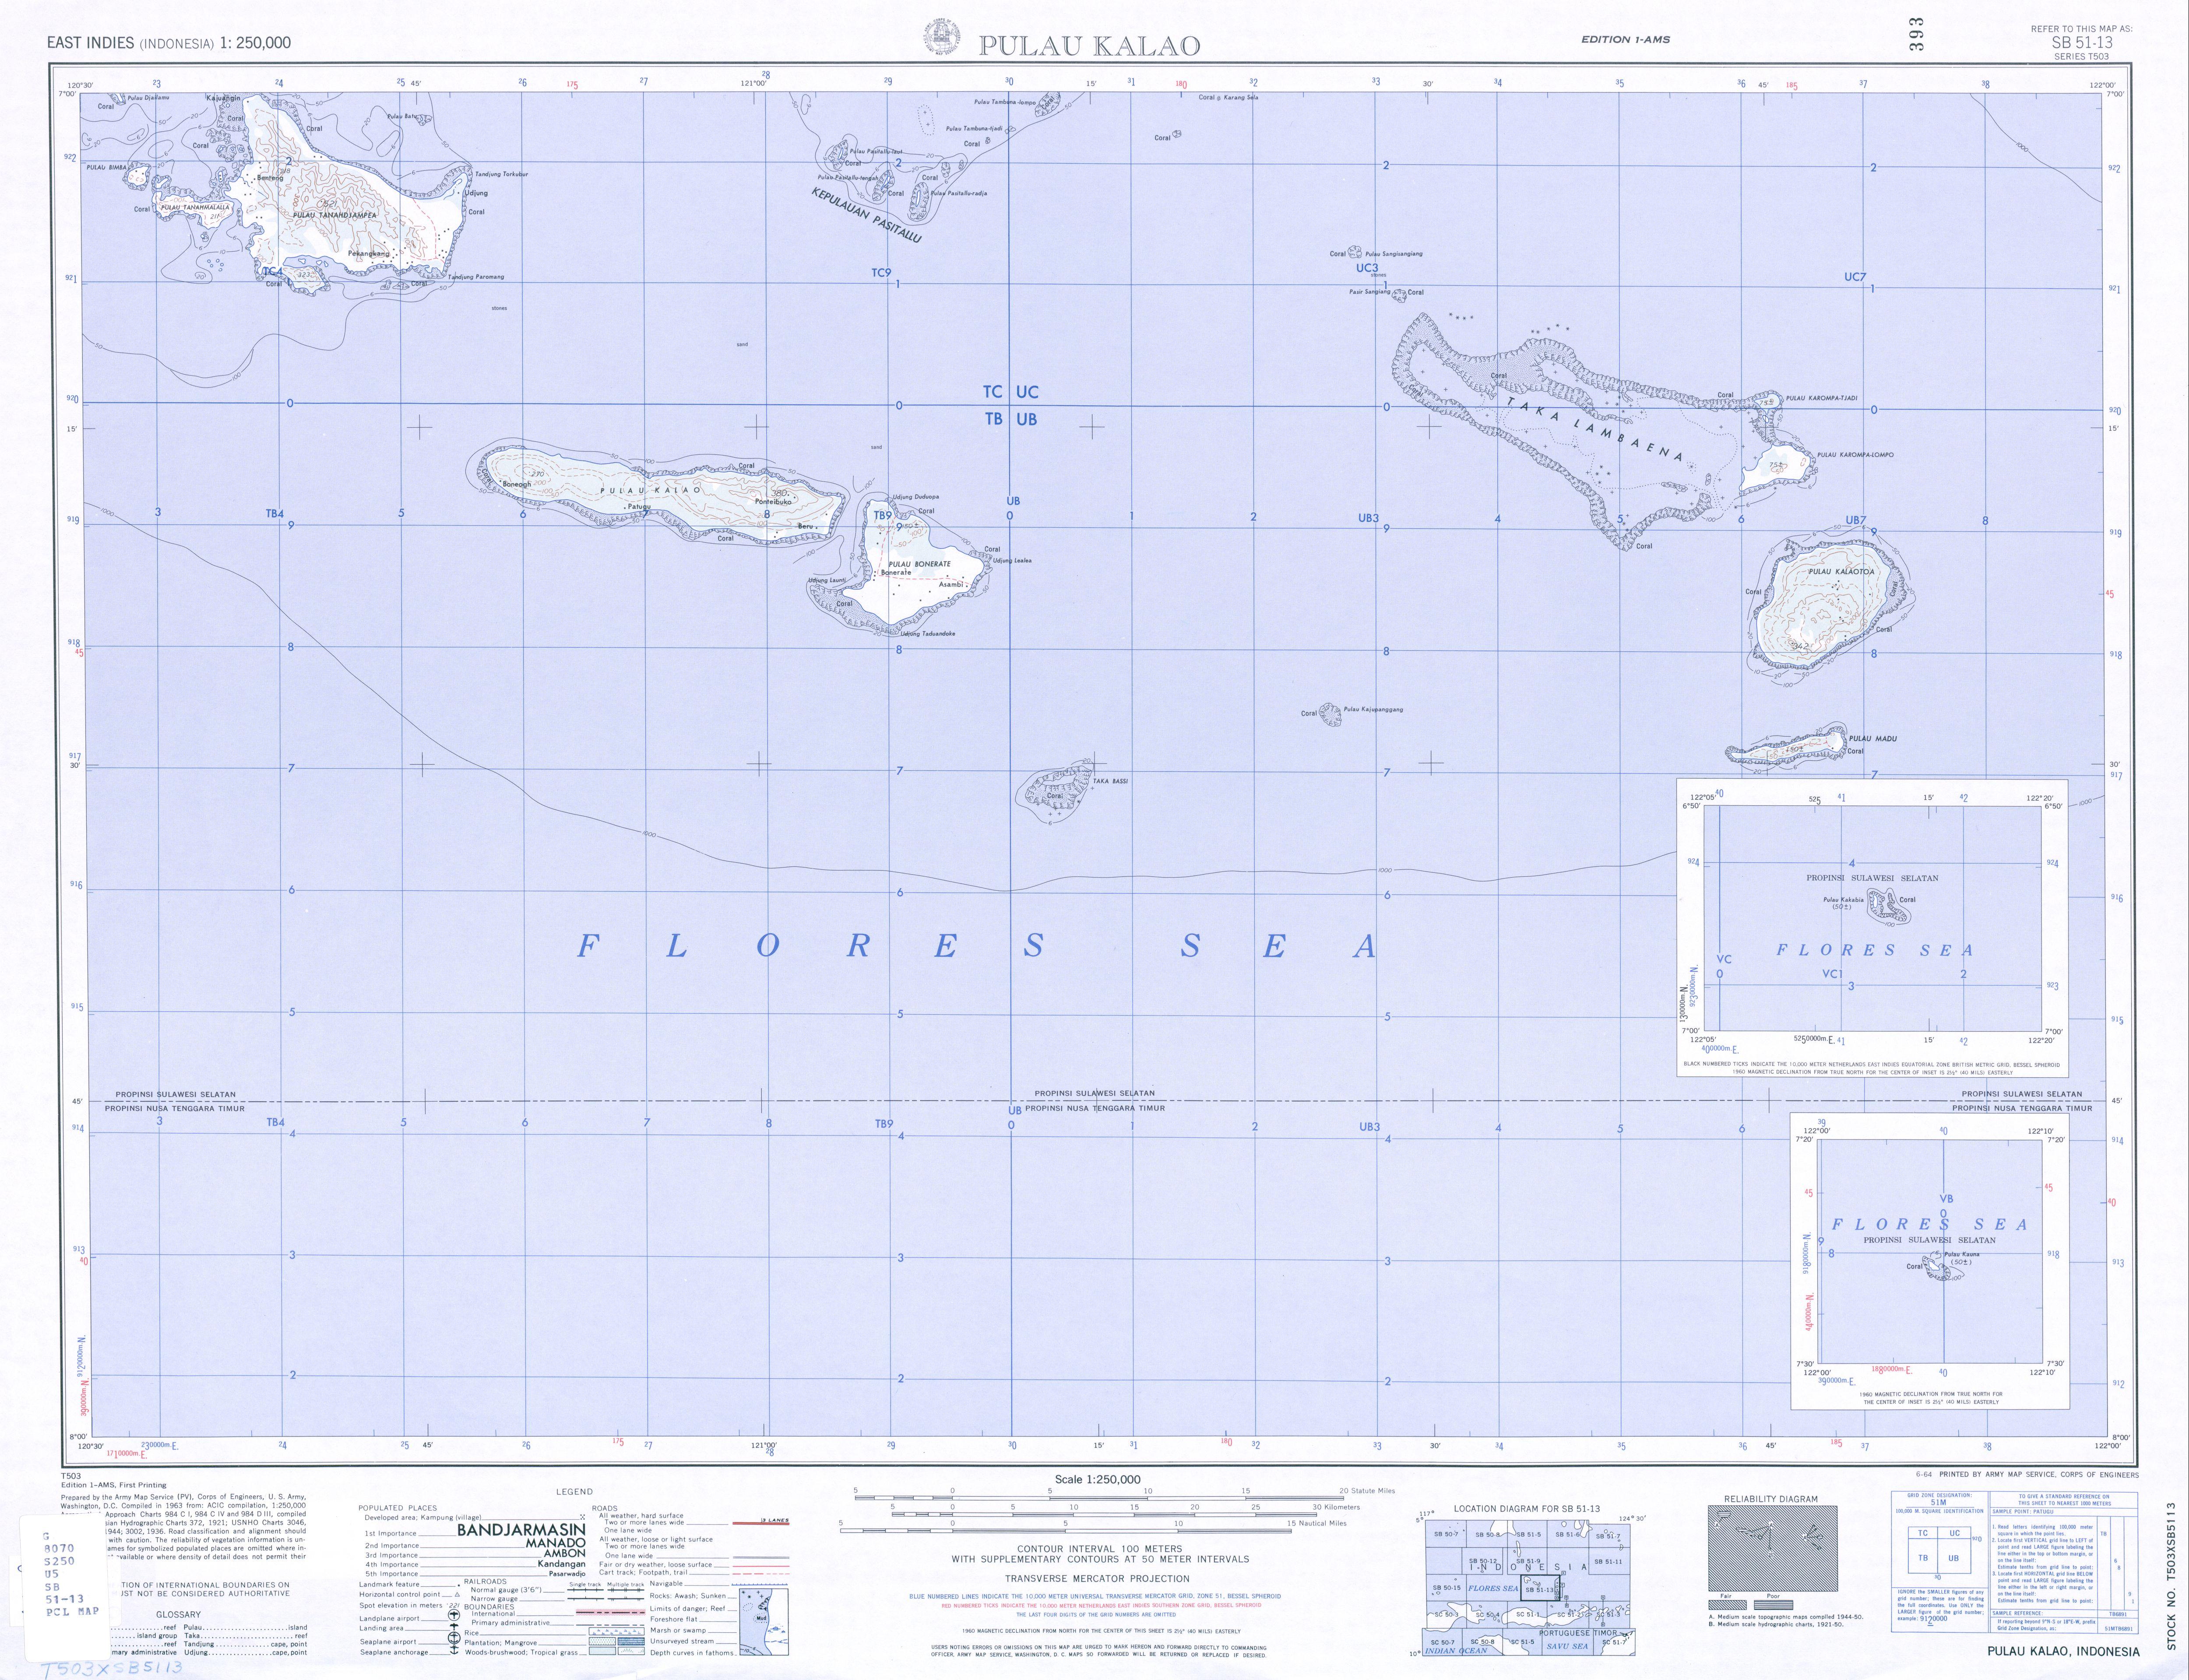 Pulau Kalao